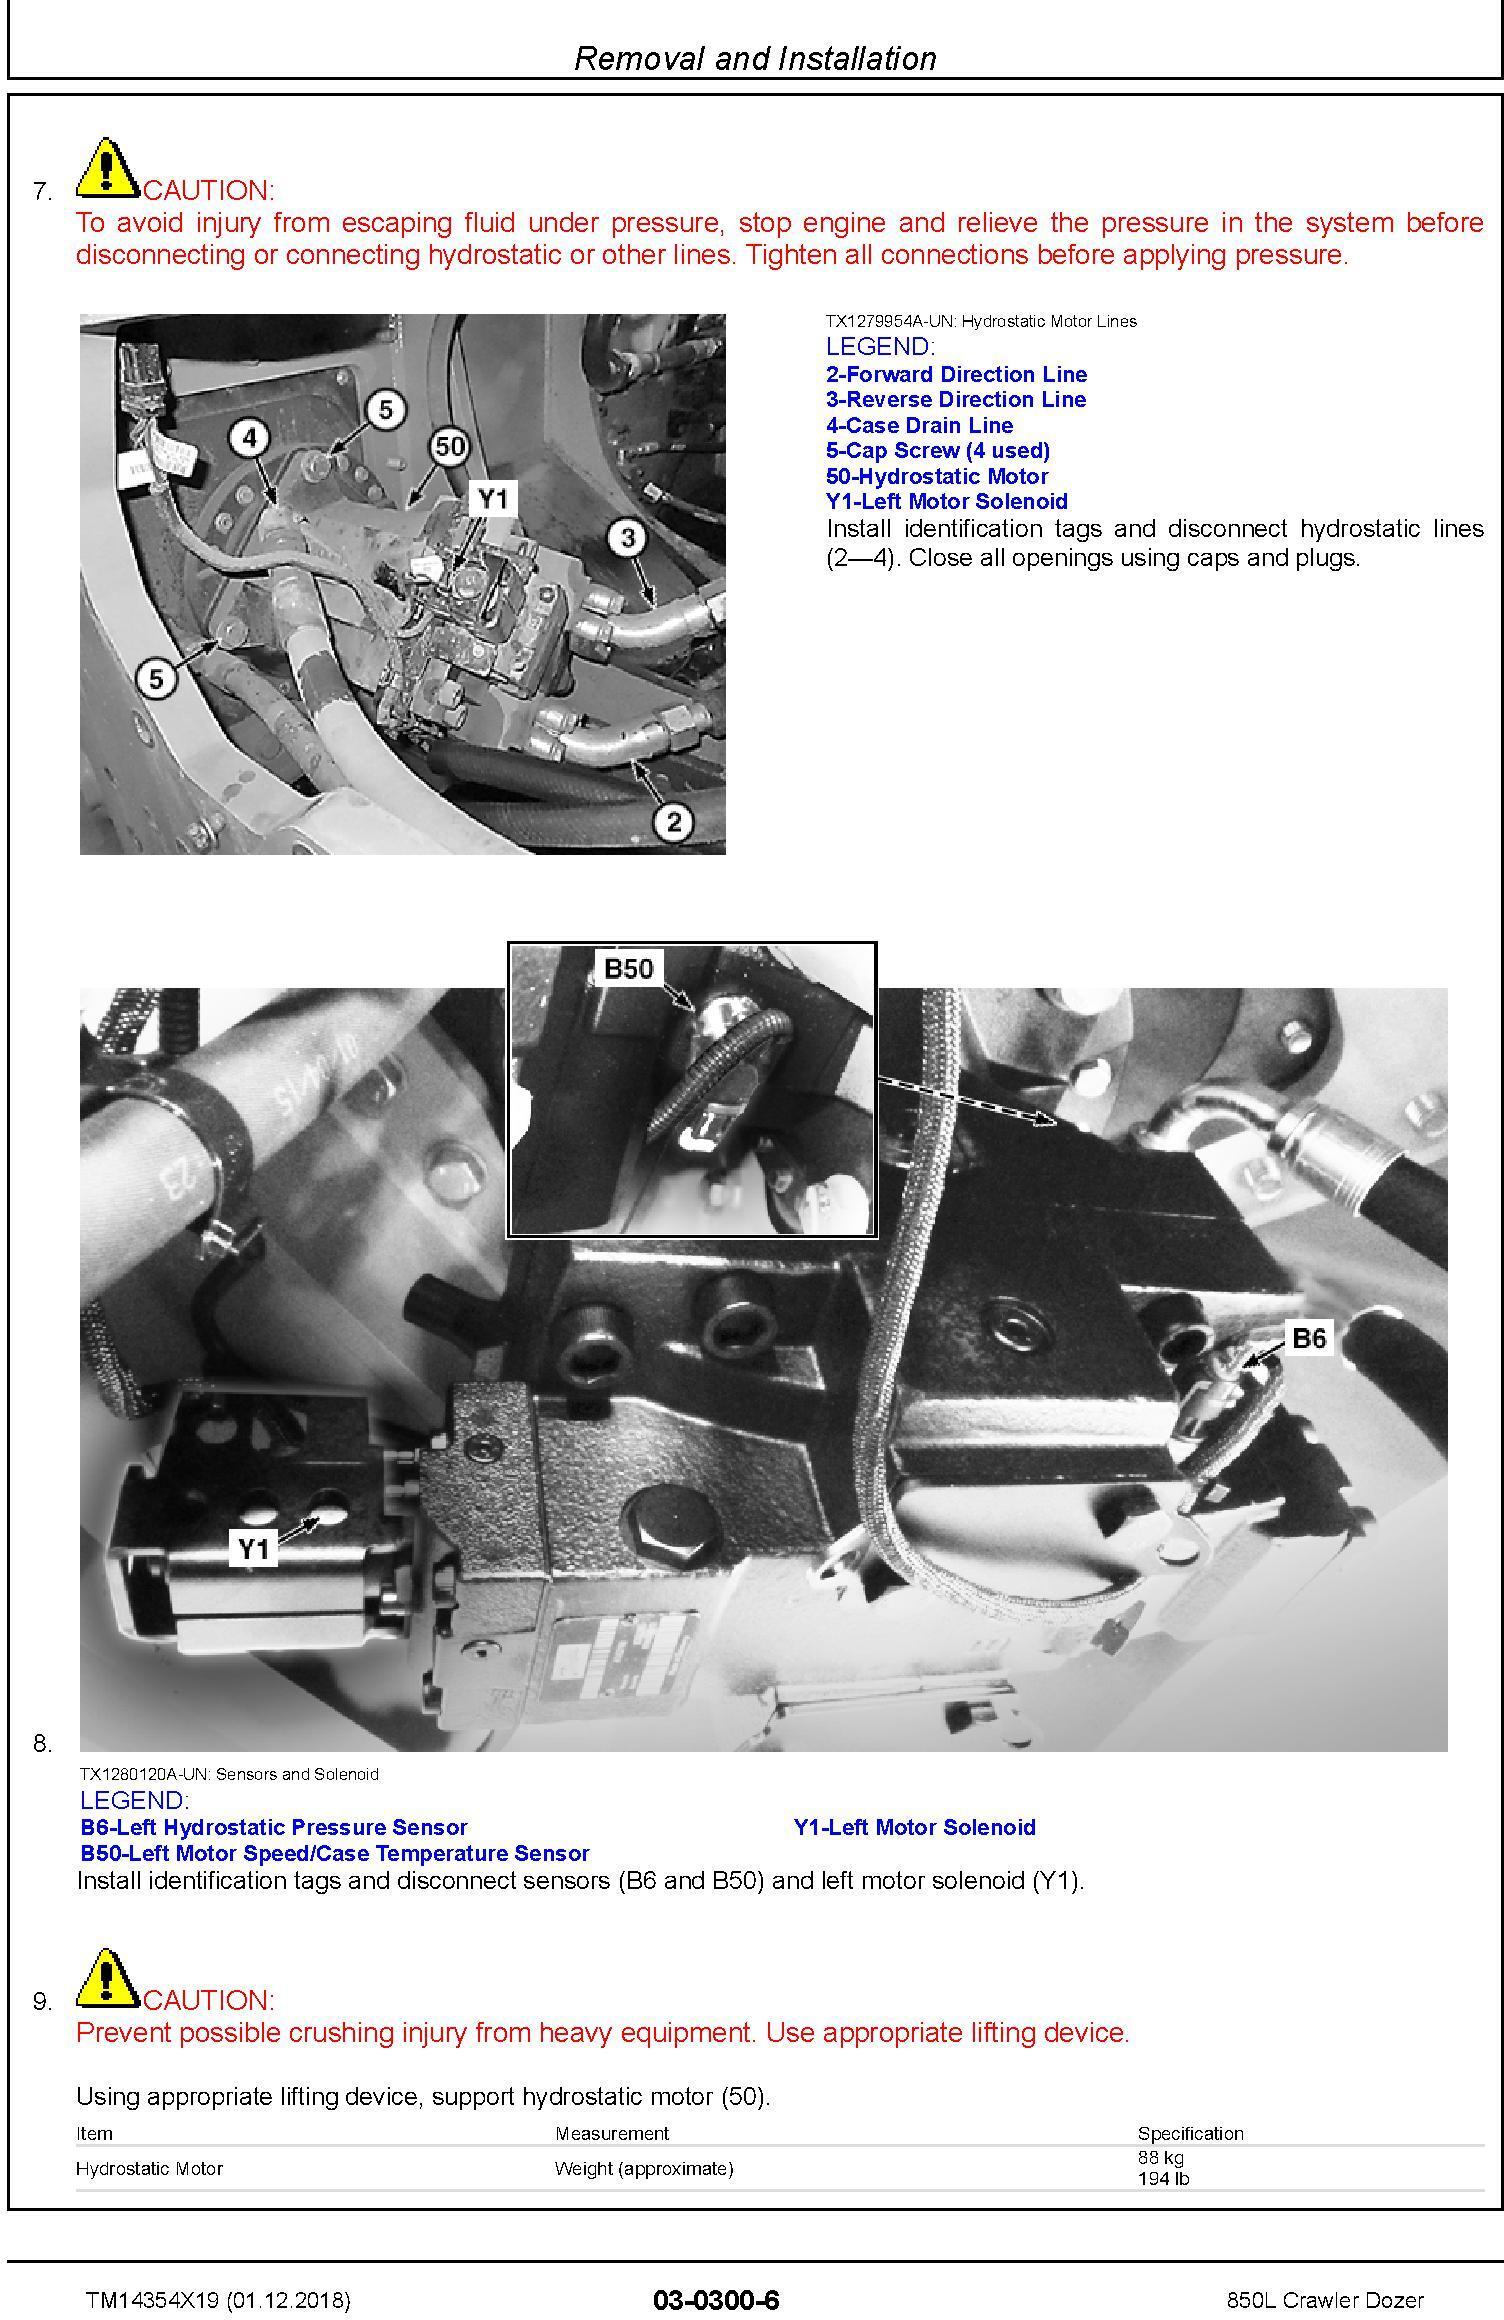 John Deere 850L Crawler Dozer Repair Technical Manual (TM14354X19) - 3